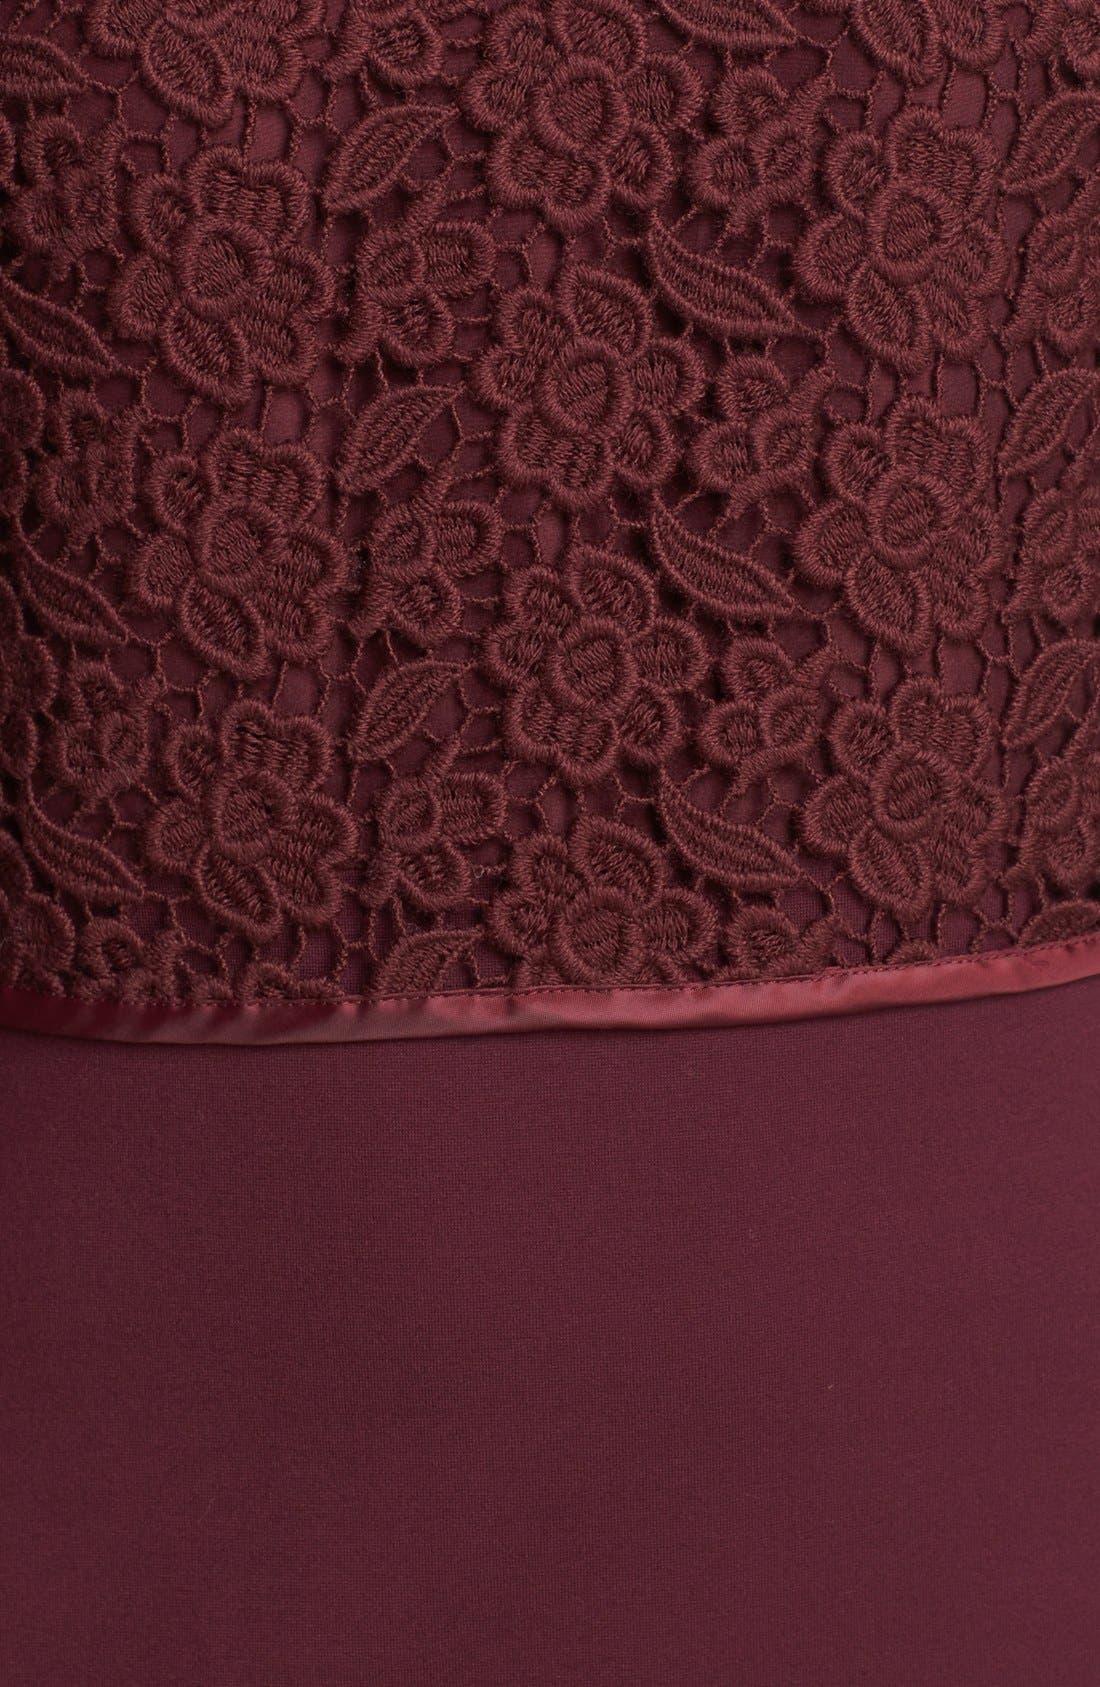 Alternate Image 3  - Weekend Max Mara 'Provino' Jersey Dress